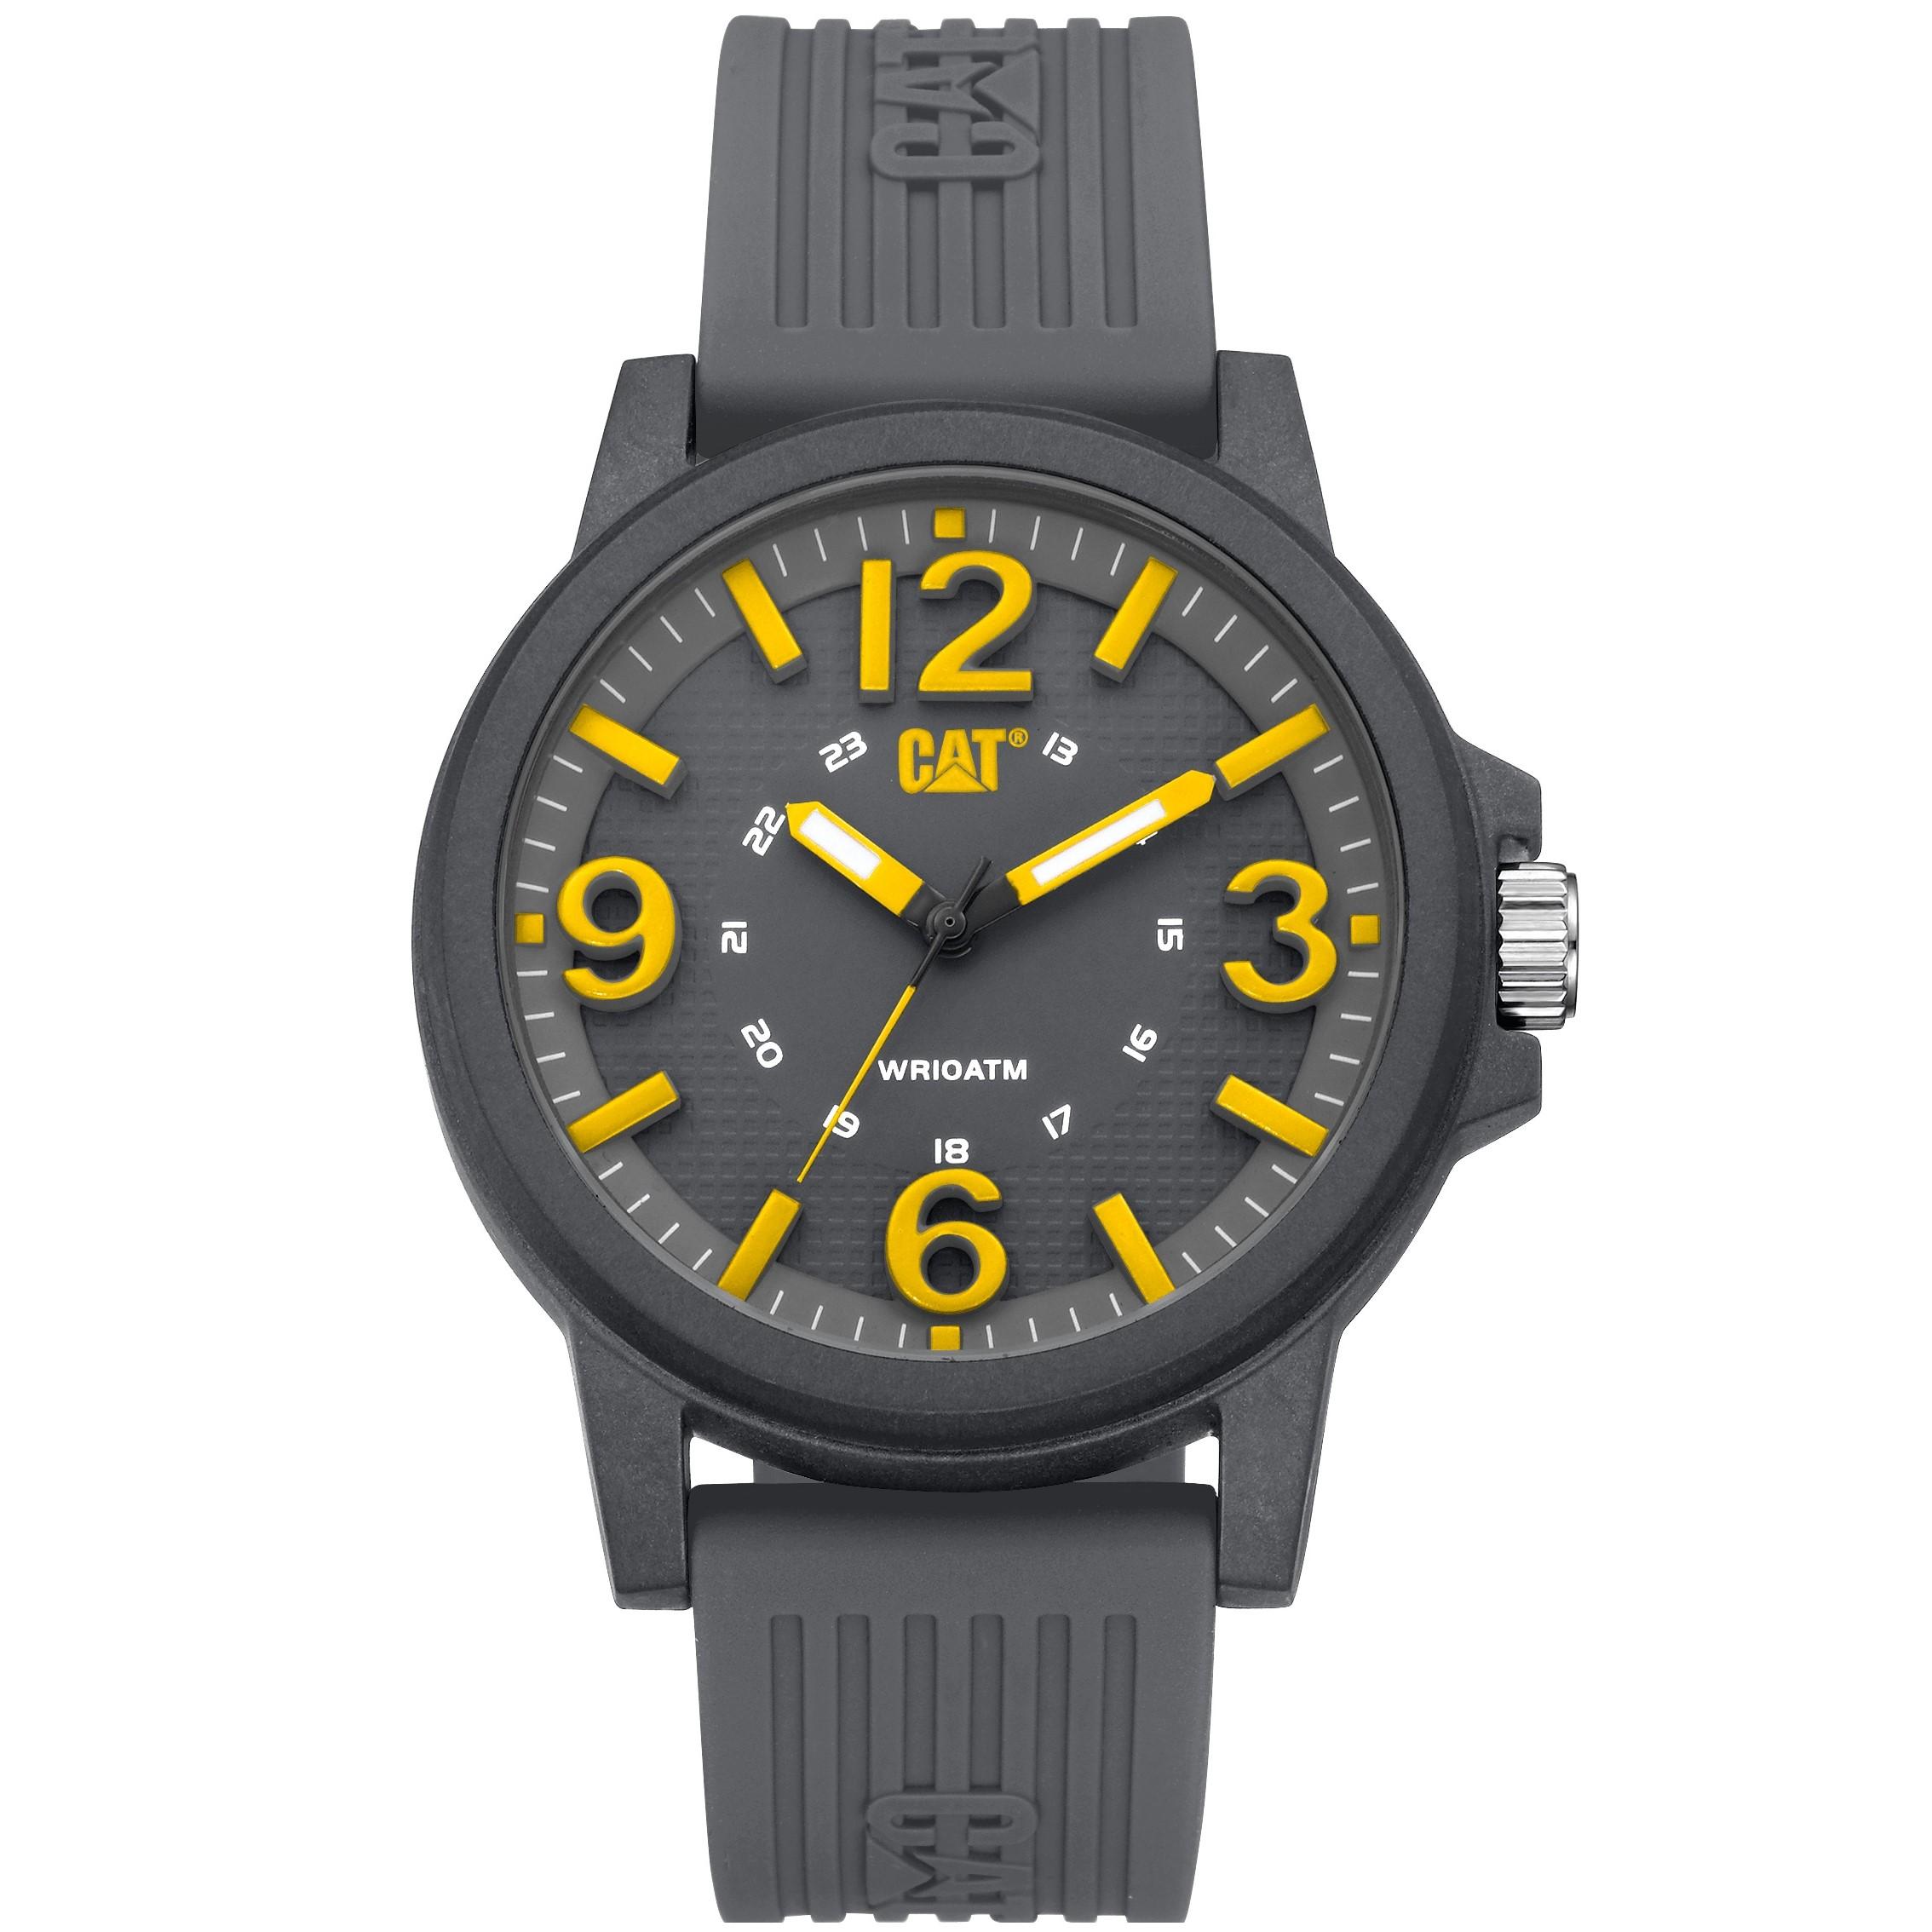 ساعت مچی عقربه ای مردانه کاترپیلار مدل LF.111.25.537